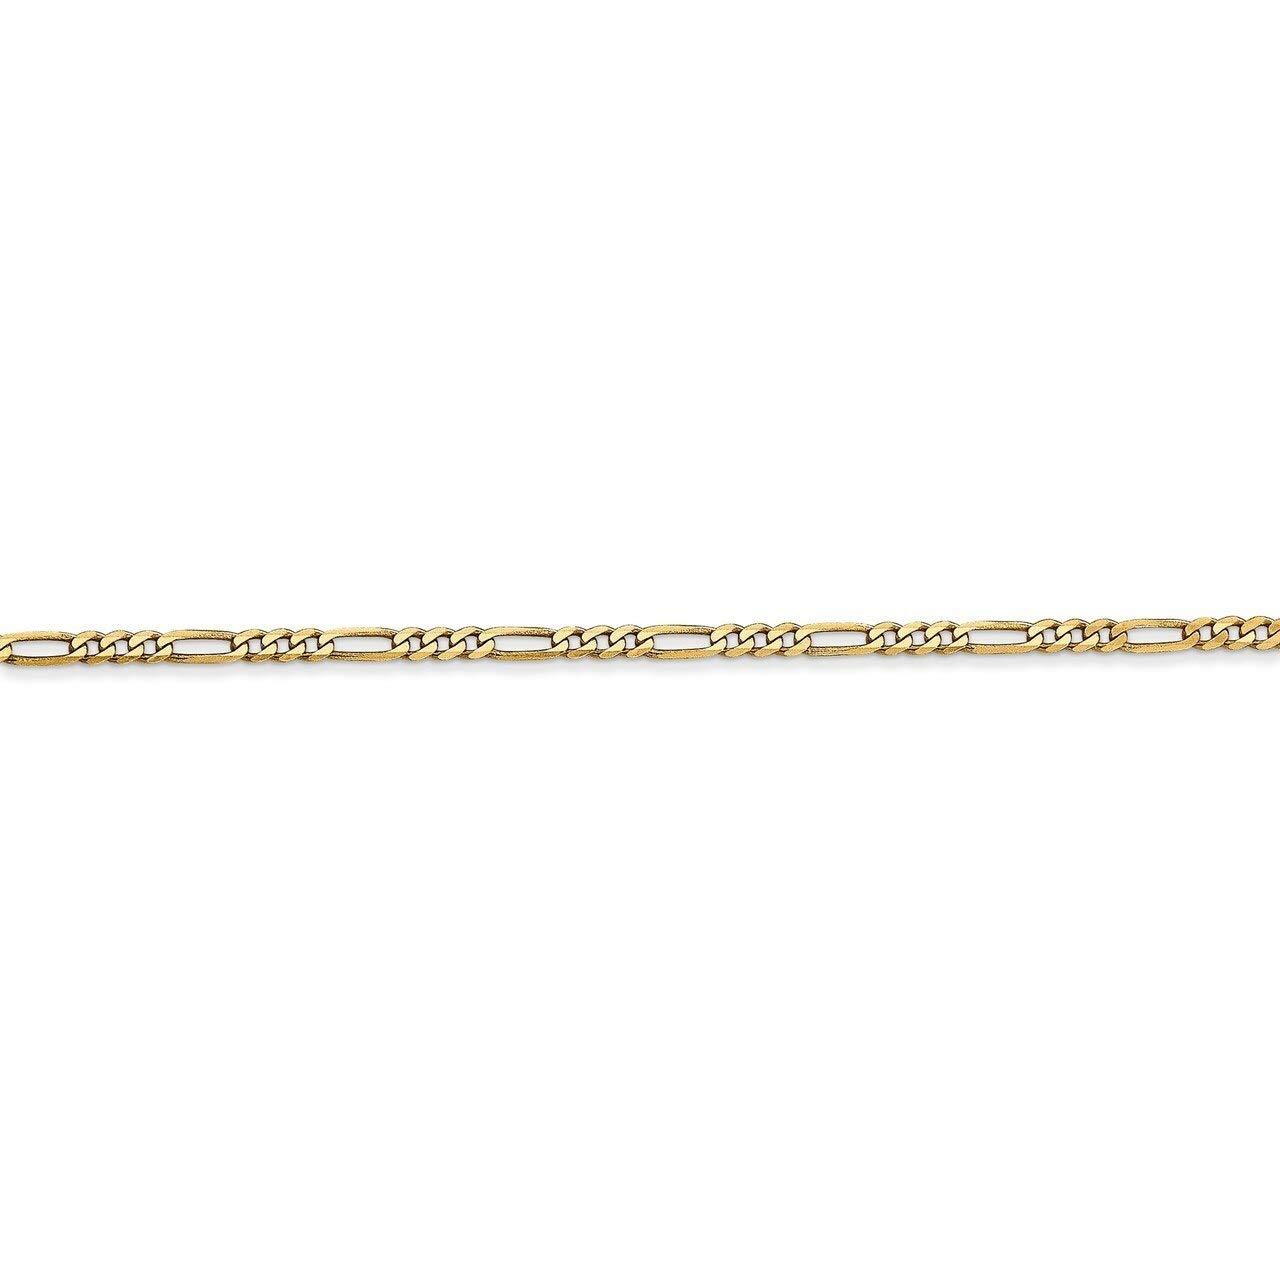 Lex /& Lu 14k Yellow Gold 1.80mm Flat Figaro Chain Necklace or Bracelet